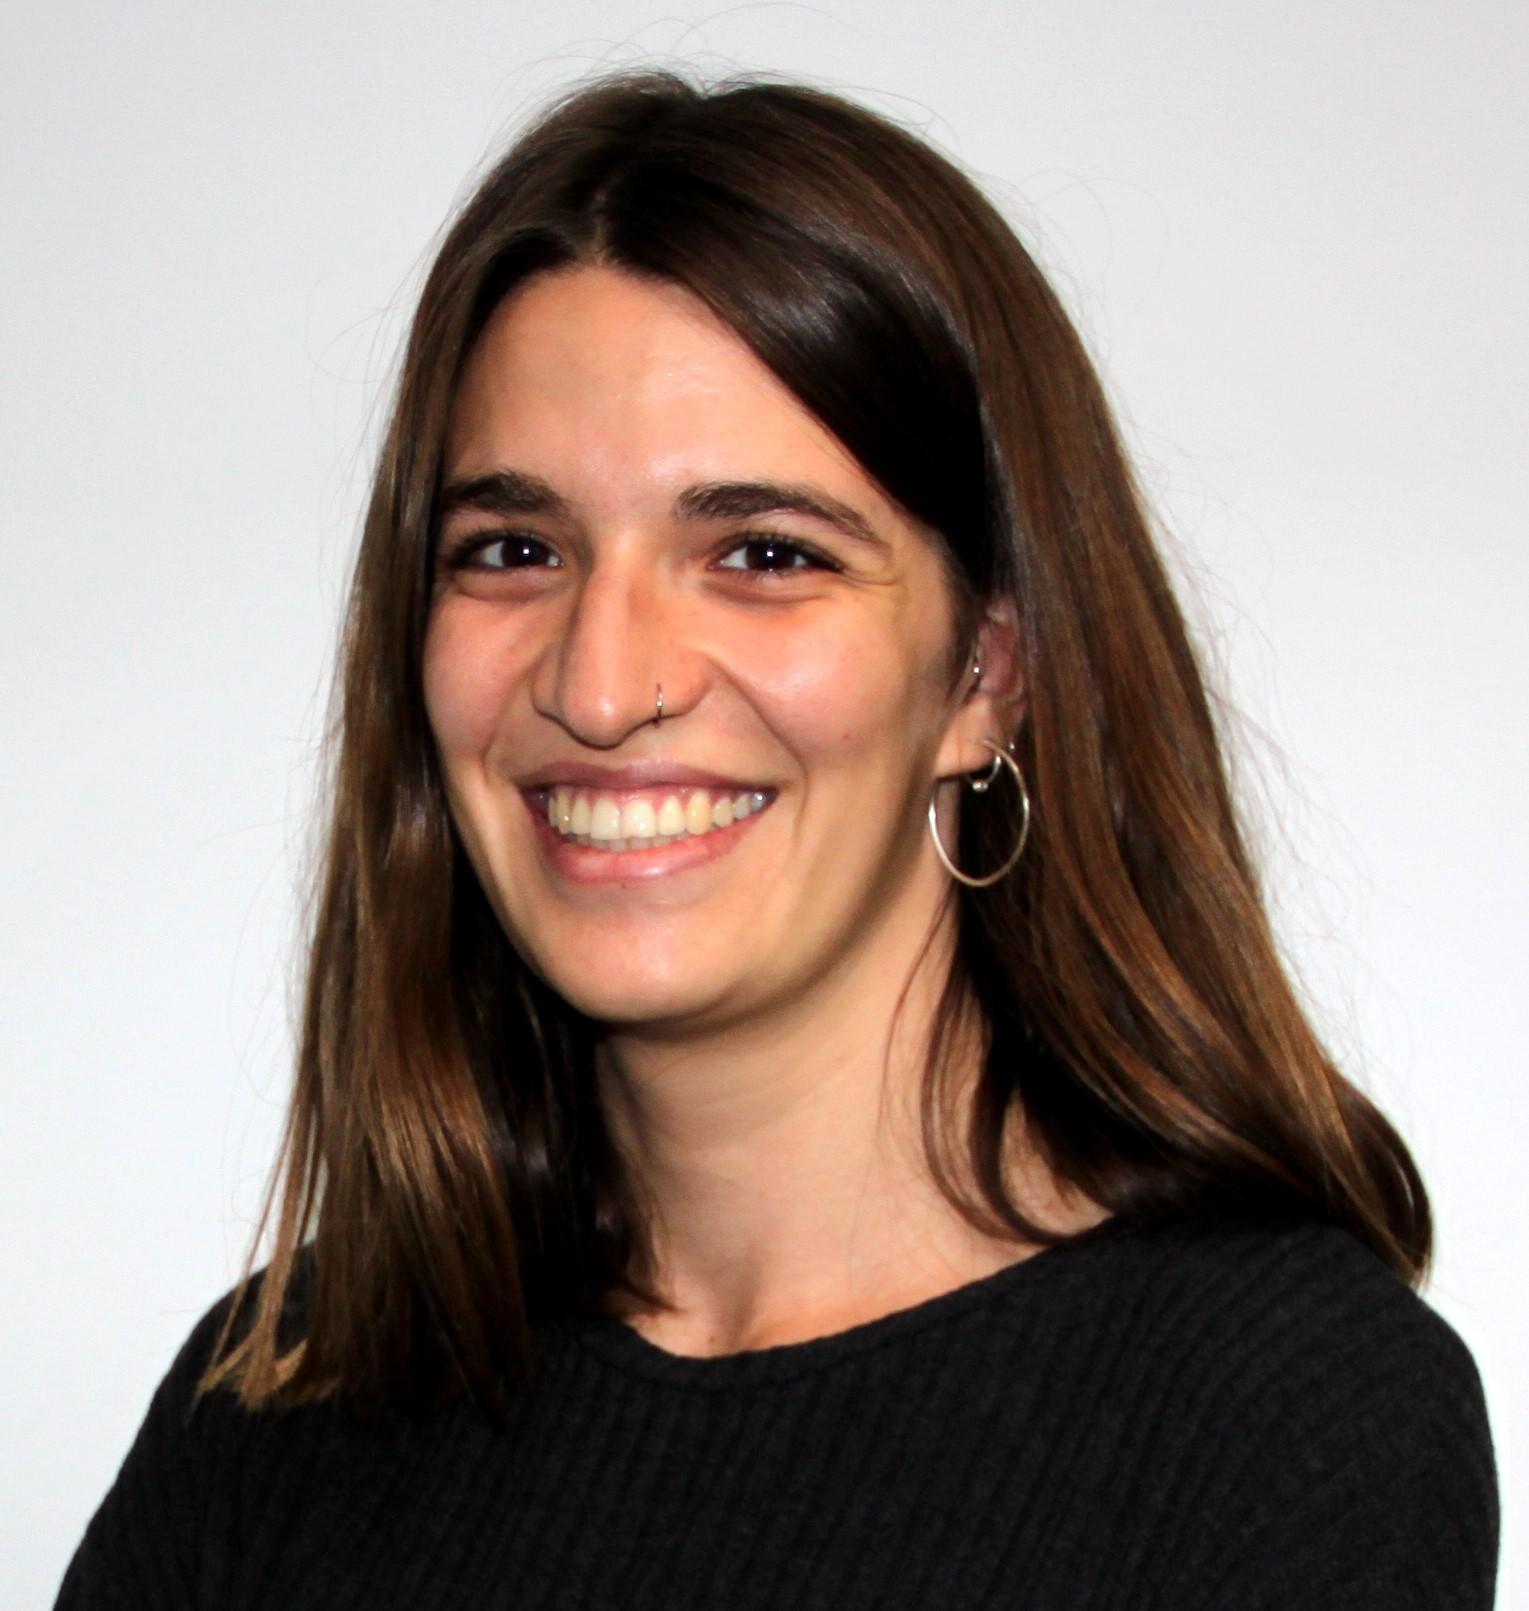 Marta Curull